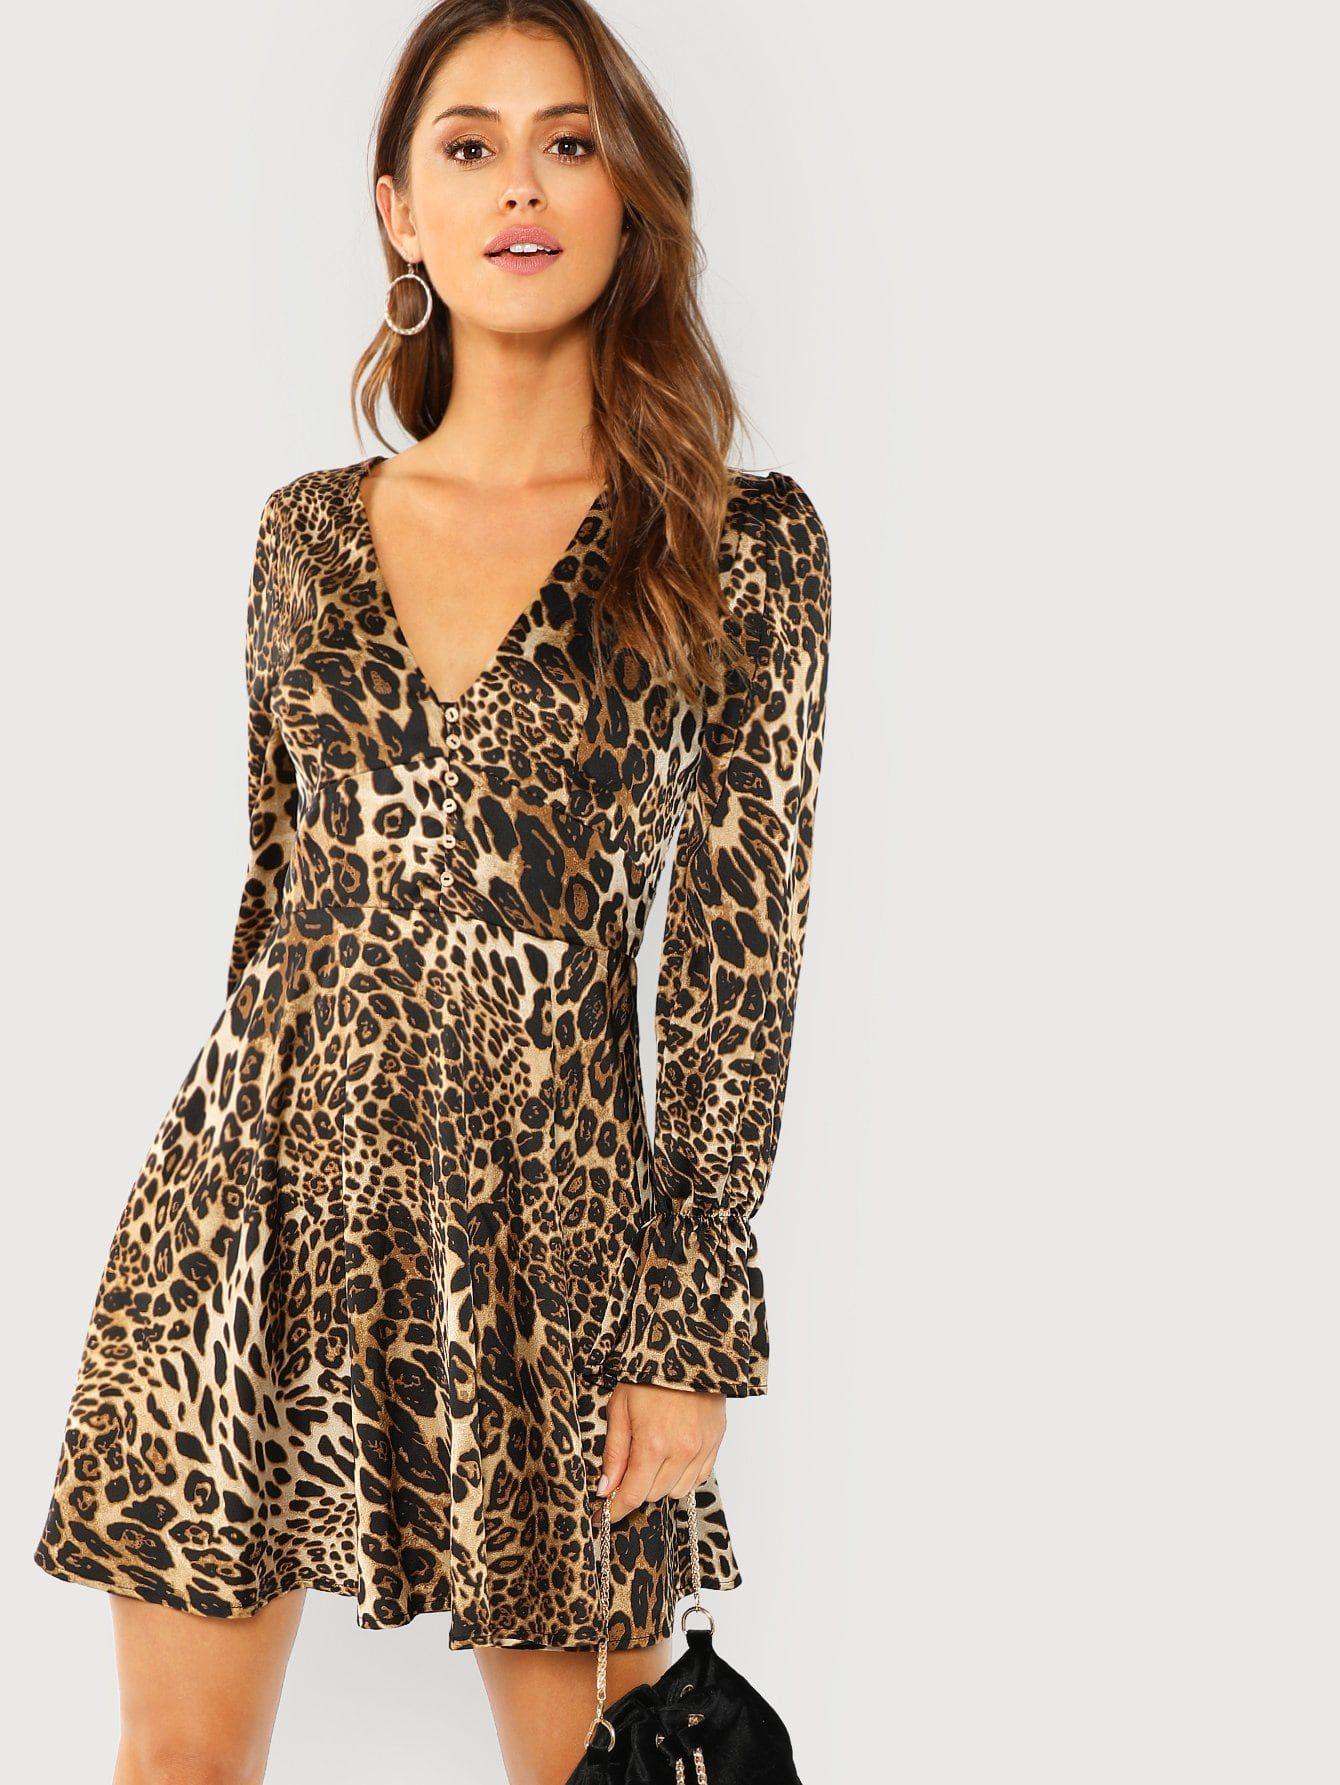 Leopard Print Flounce Sleeve Fit Flare Dress Woman Women Elegance Clothes Dresses Fit Flare Dress Flare Dress [ 1785 x 1340 Pixel ]